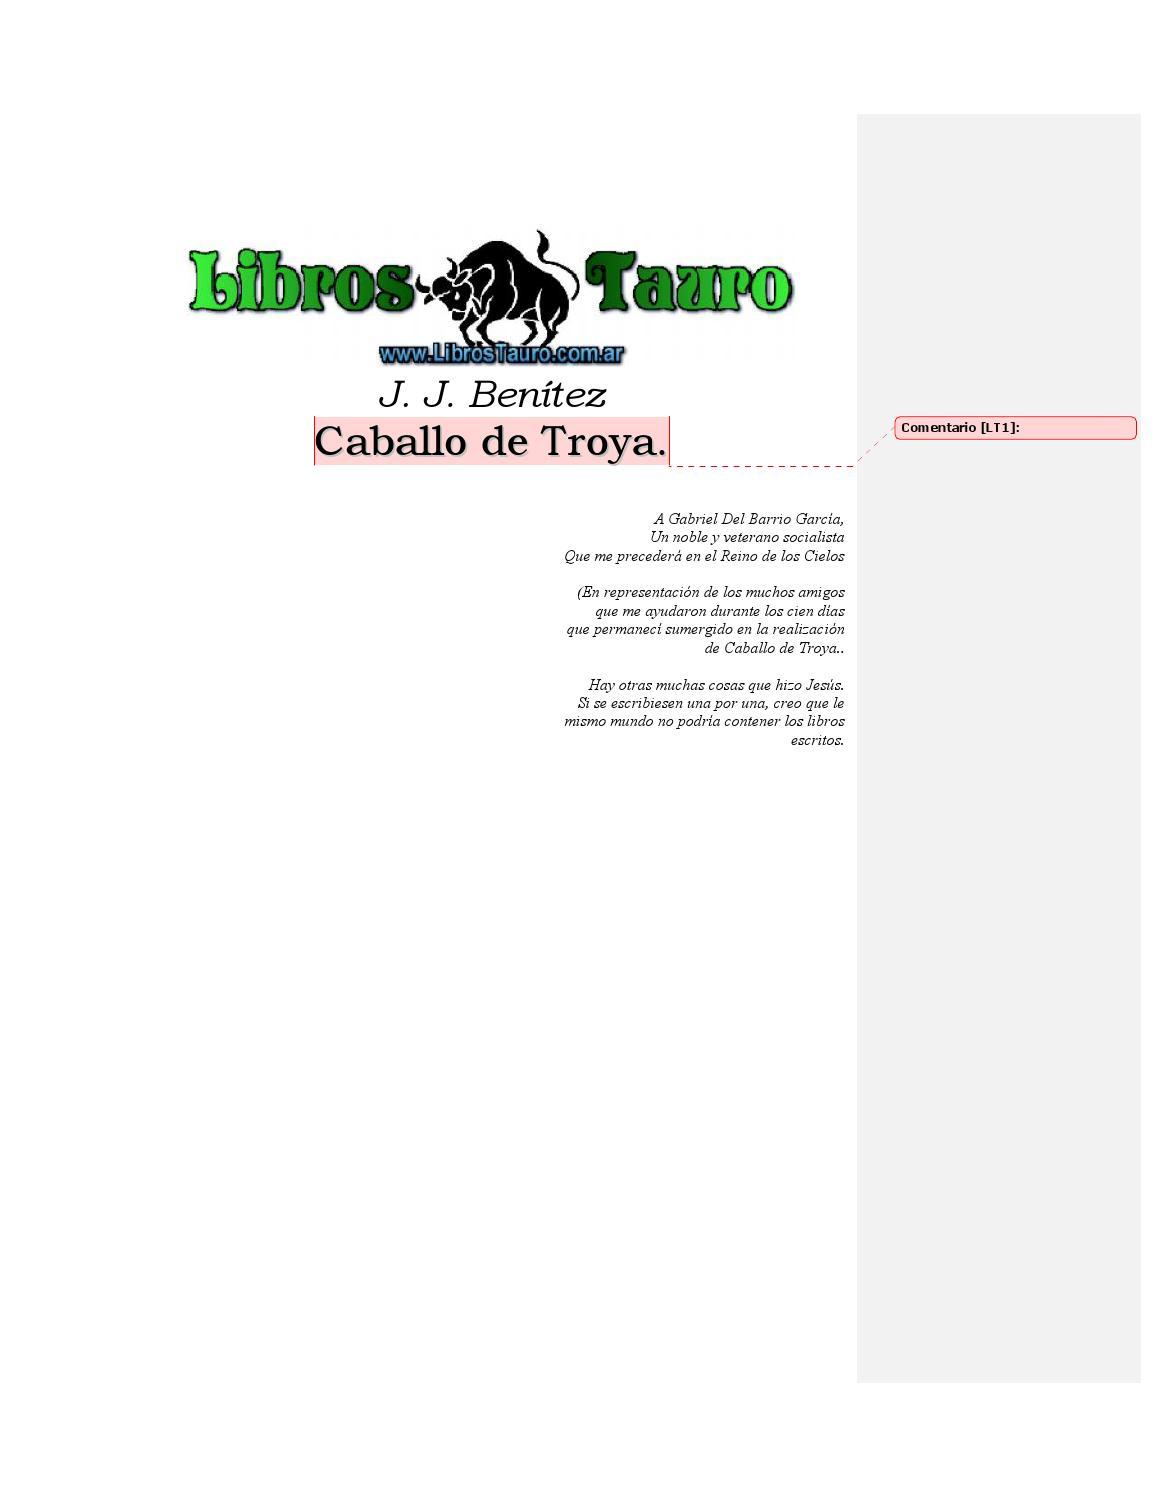 Caballo de Troya - J. J. Benitez. by Orlando Alvarez - issuu